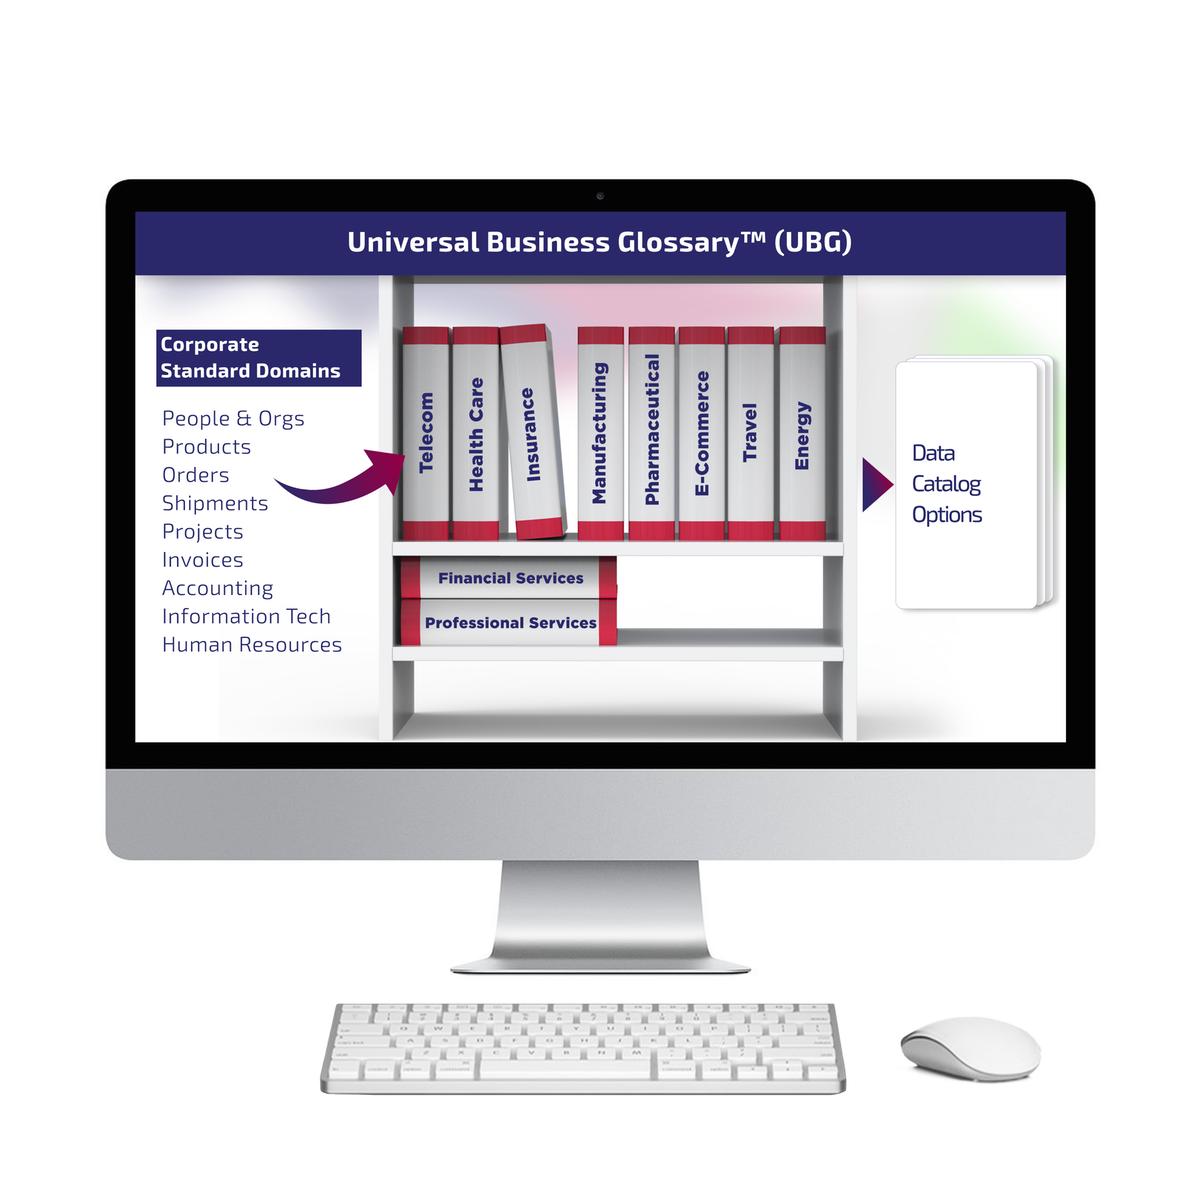 Universal Business Glossary